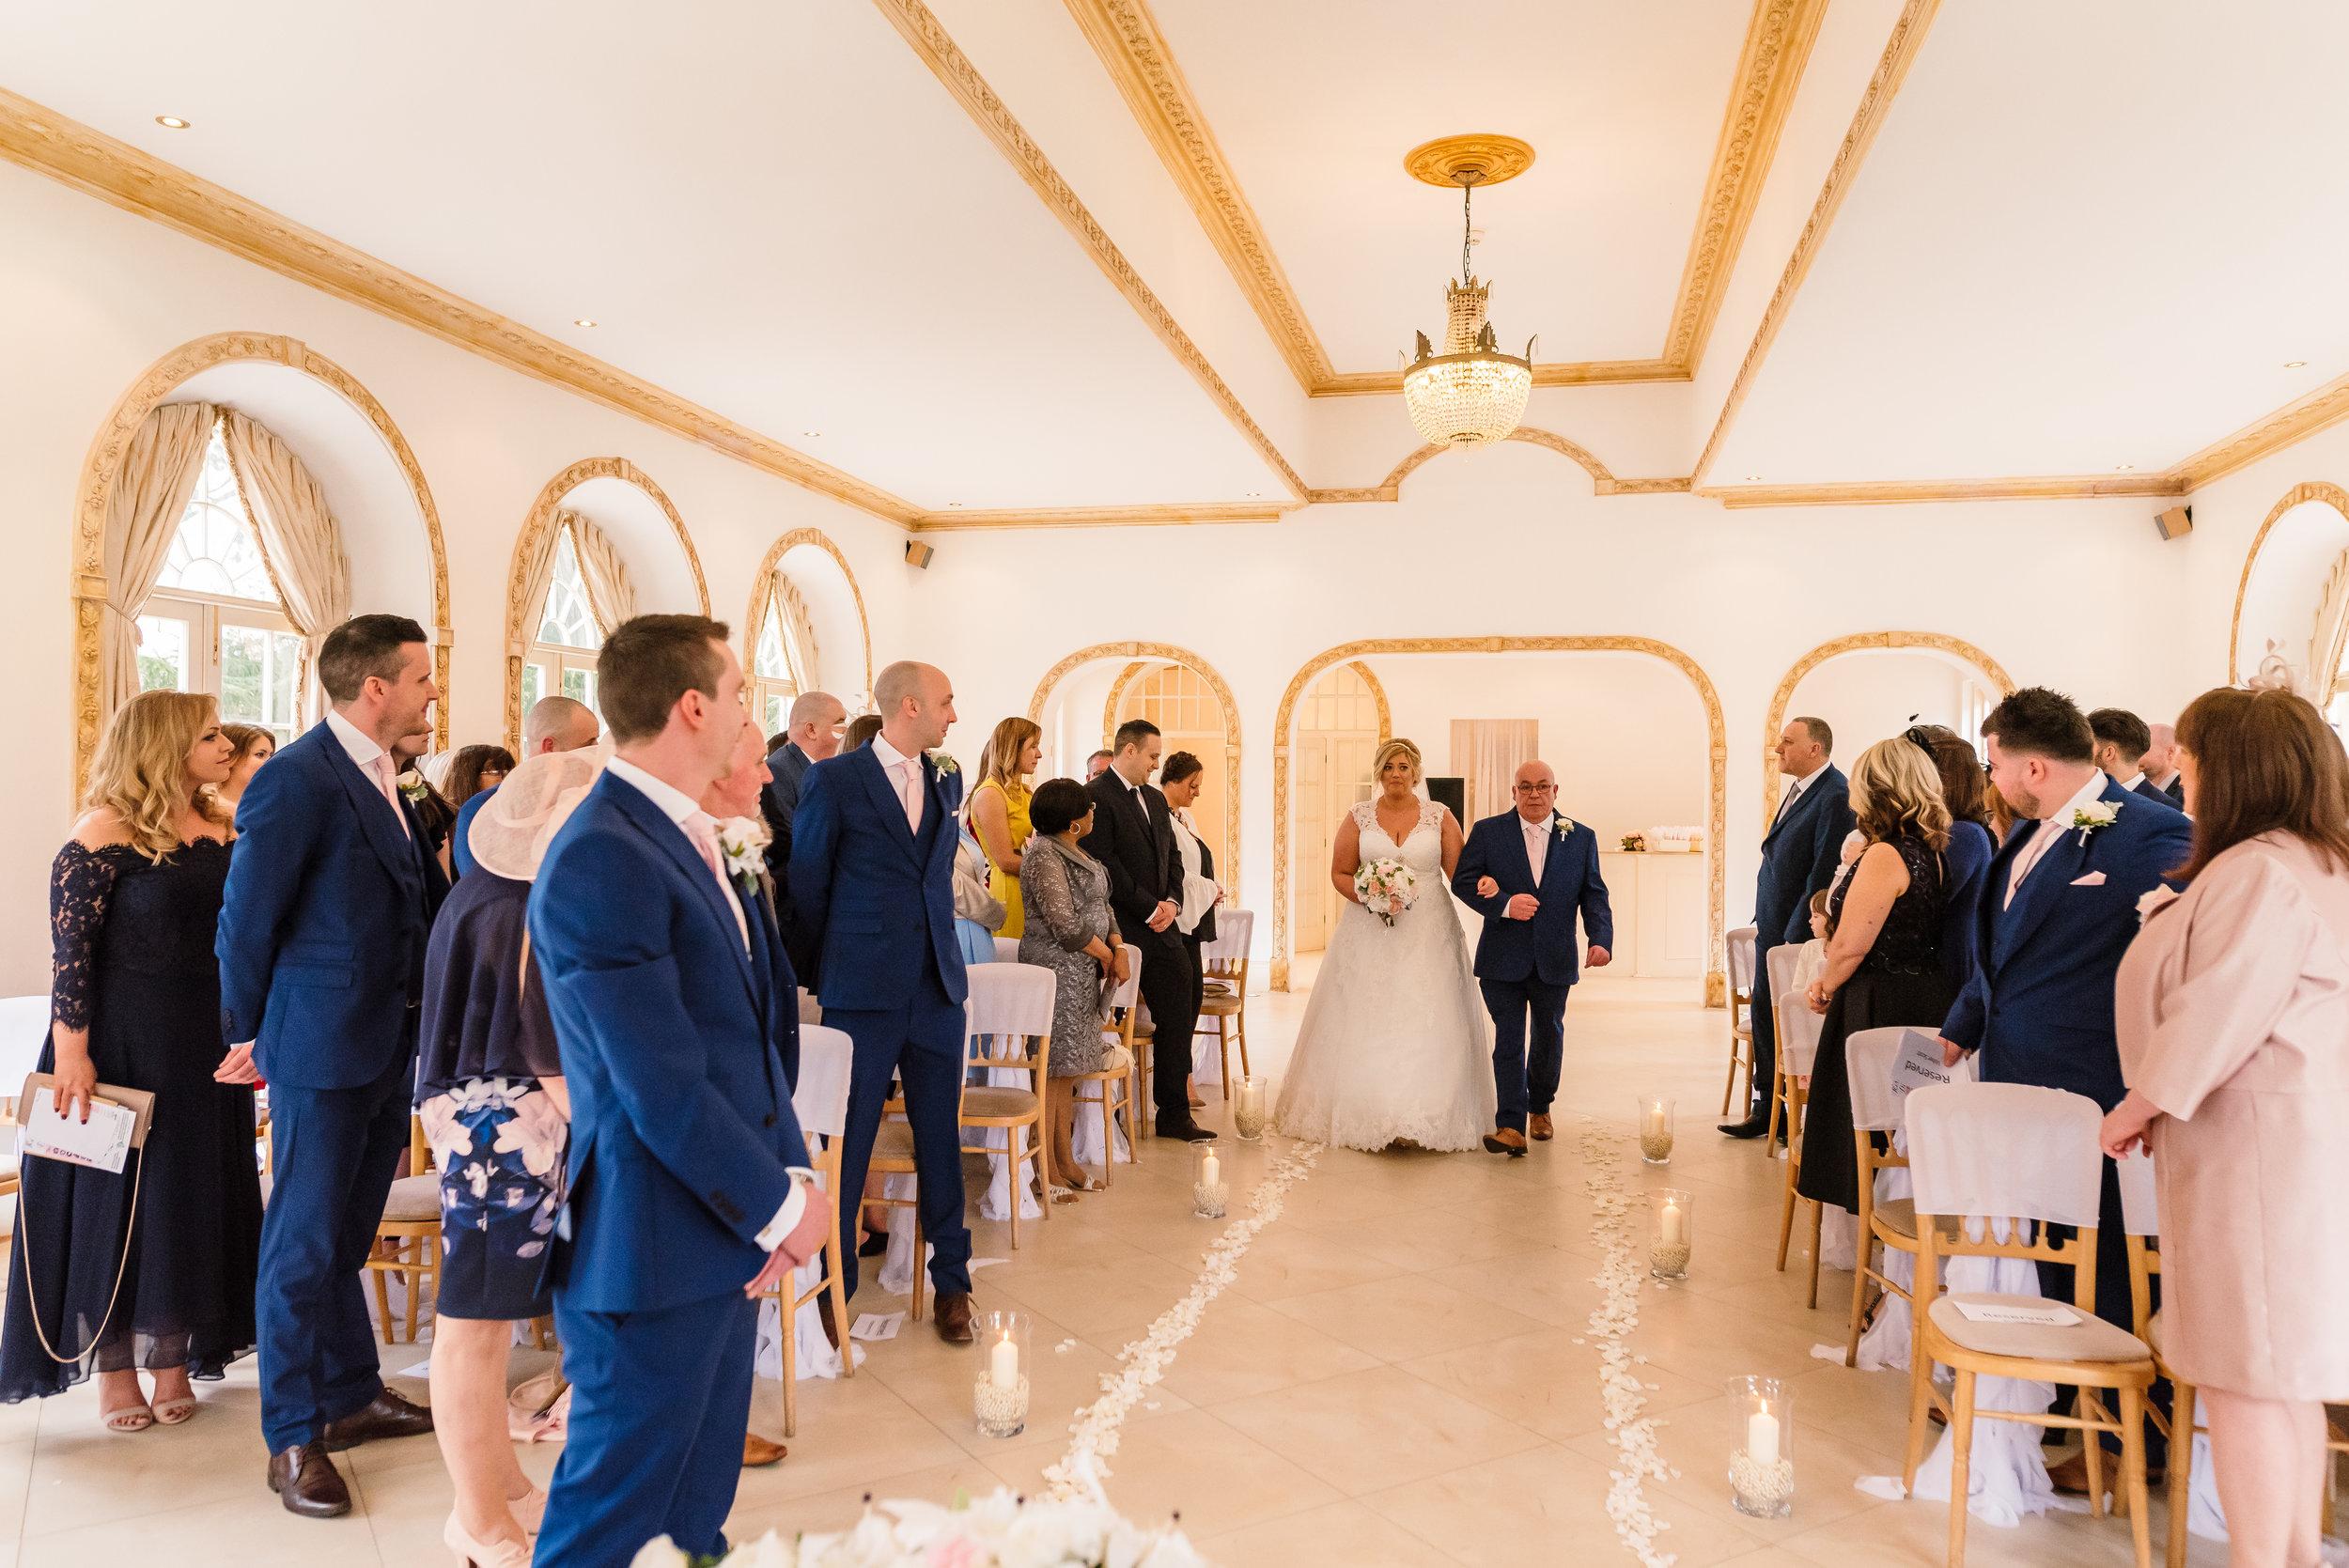 Sarah-Fishlock-Photography : Hampshire-wedding-photographer-hampshire : fleet-wedding-photographer-fleet : Northbrook-Park-Wedding-Photographer : Northbrook-Park-Wedding-Venue : natural-wedding-photographer-hampshire-348.jpg